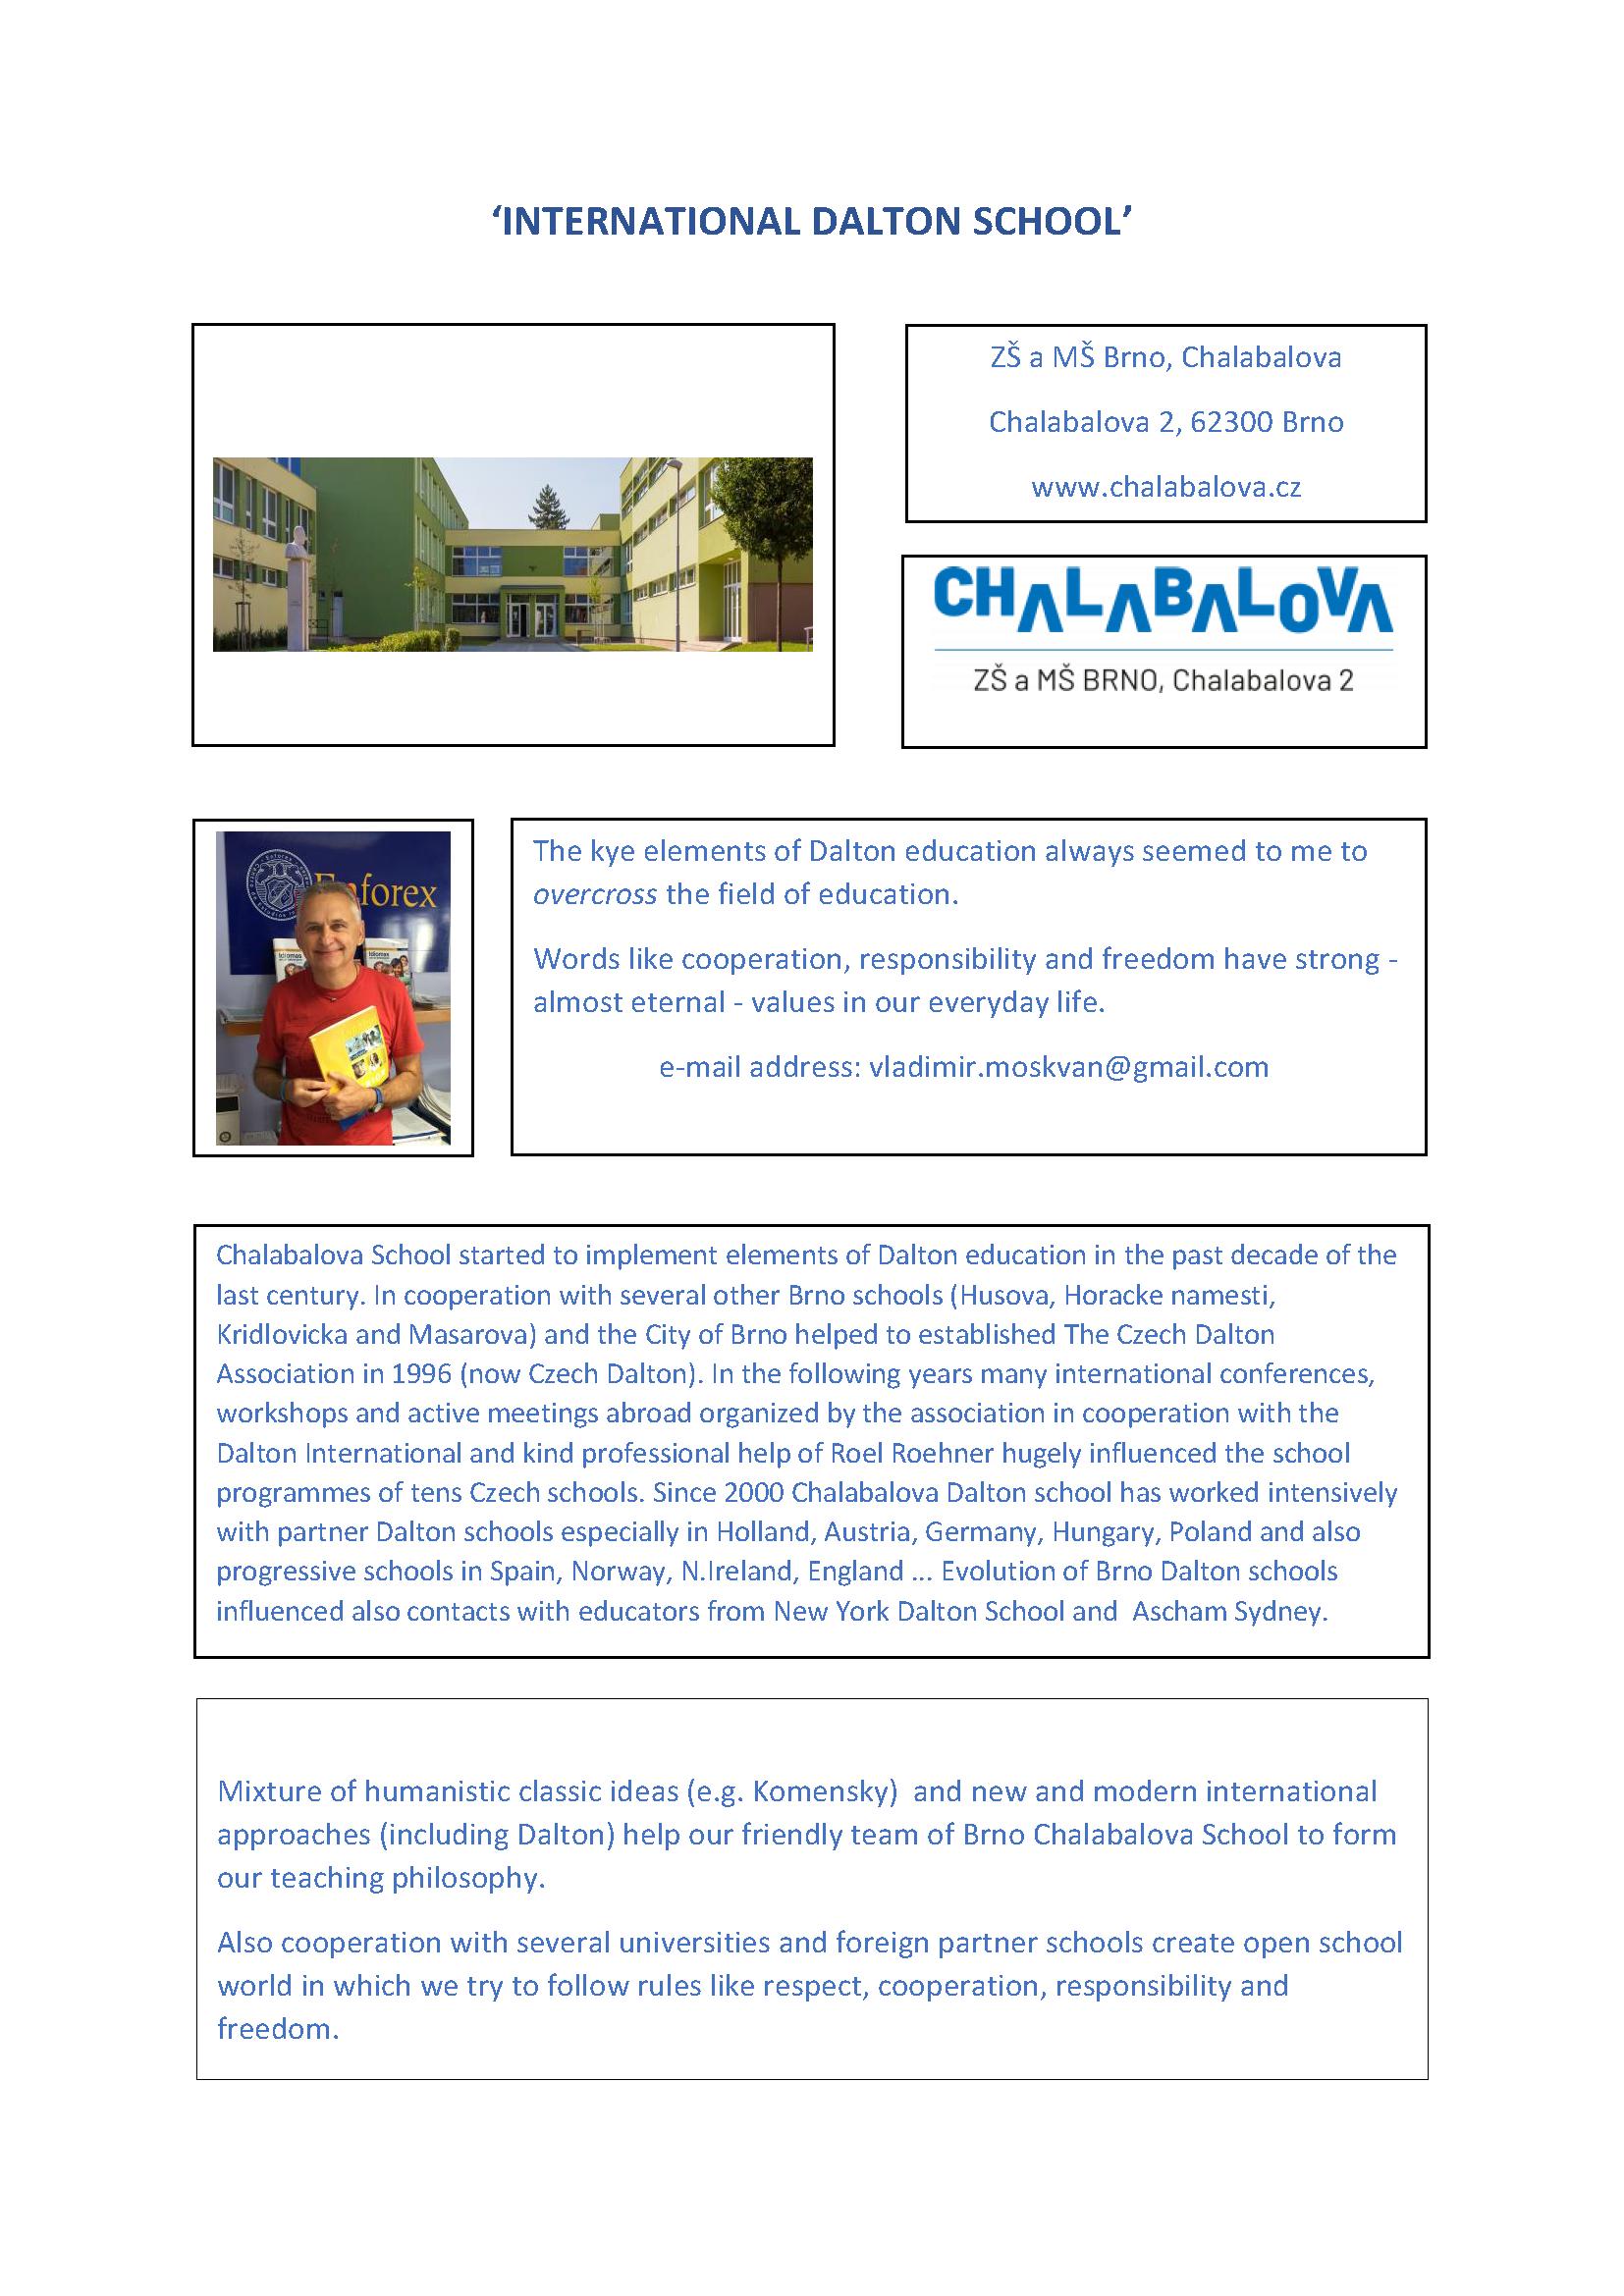 5. CHALABALOVA DALTON SCHOOL - INFO website DALTON INT